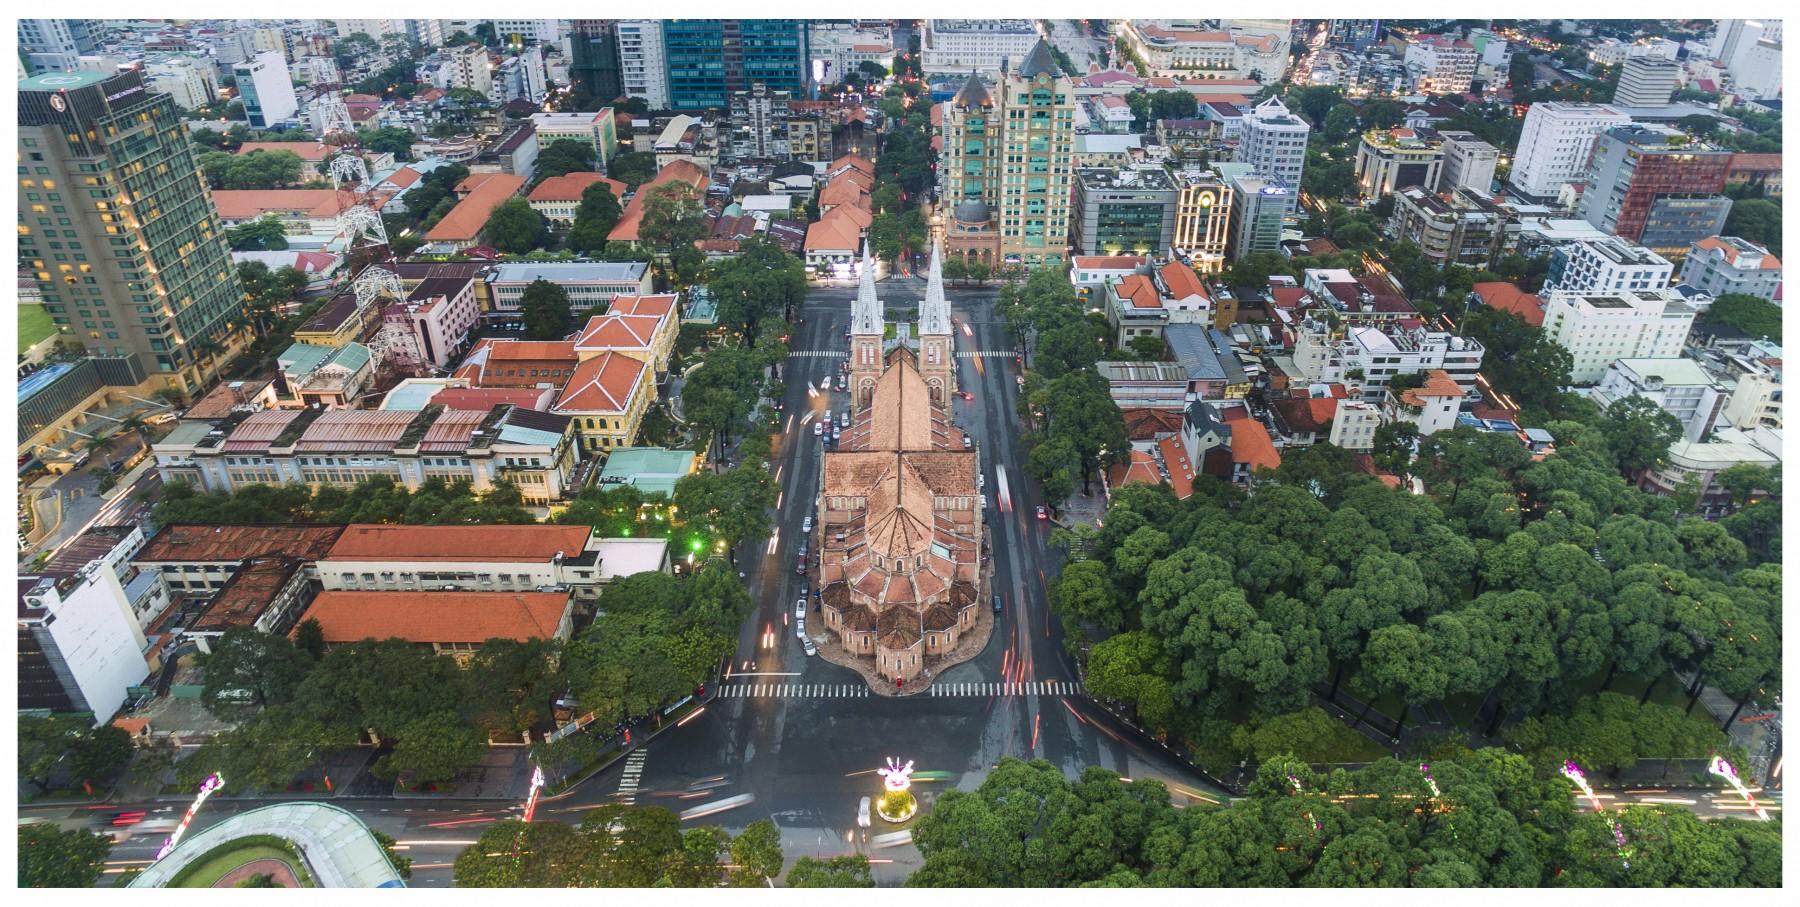 part-3-where-to-go-on-nguyen-thi-minh-khai-street